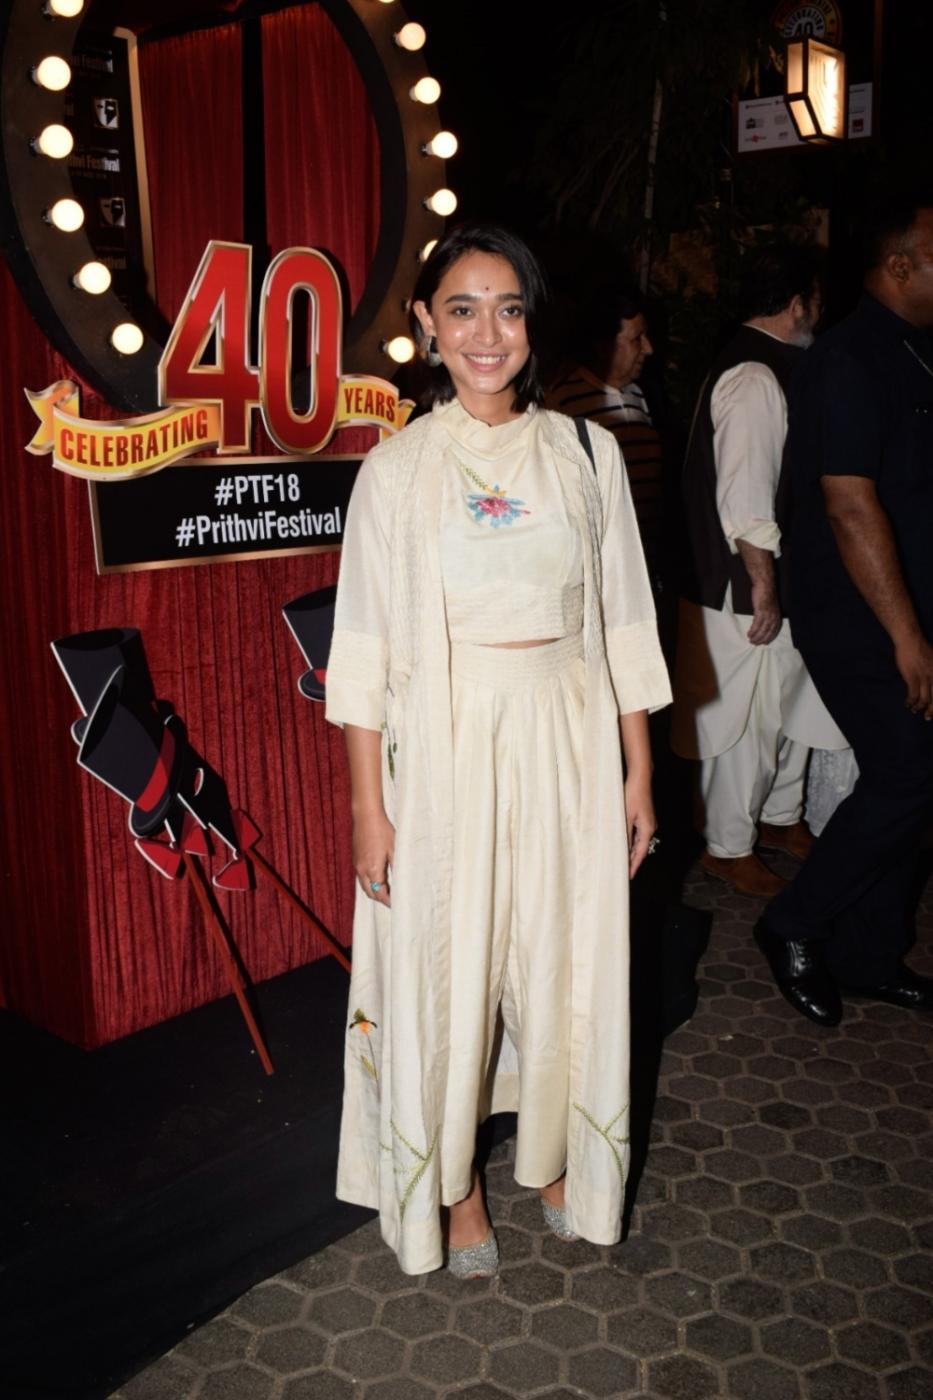 Mumbai: Actress Sayani Gupta at the 40th anniversary celebration of the Prithvi Theatre in Mumbai on Nov 5, 2018. (Photo: IANS) by .